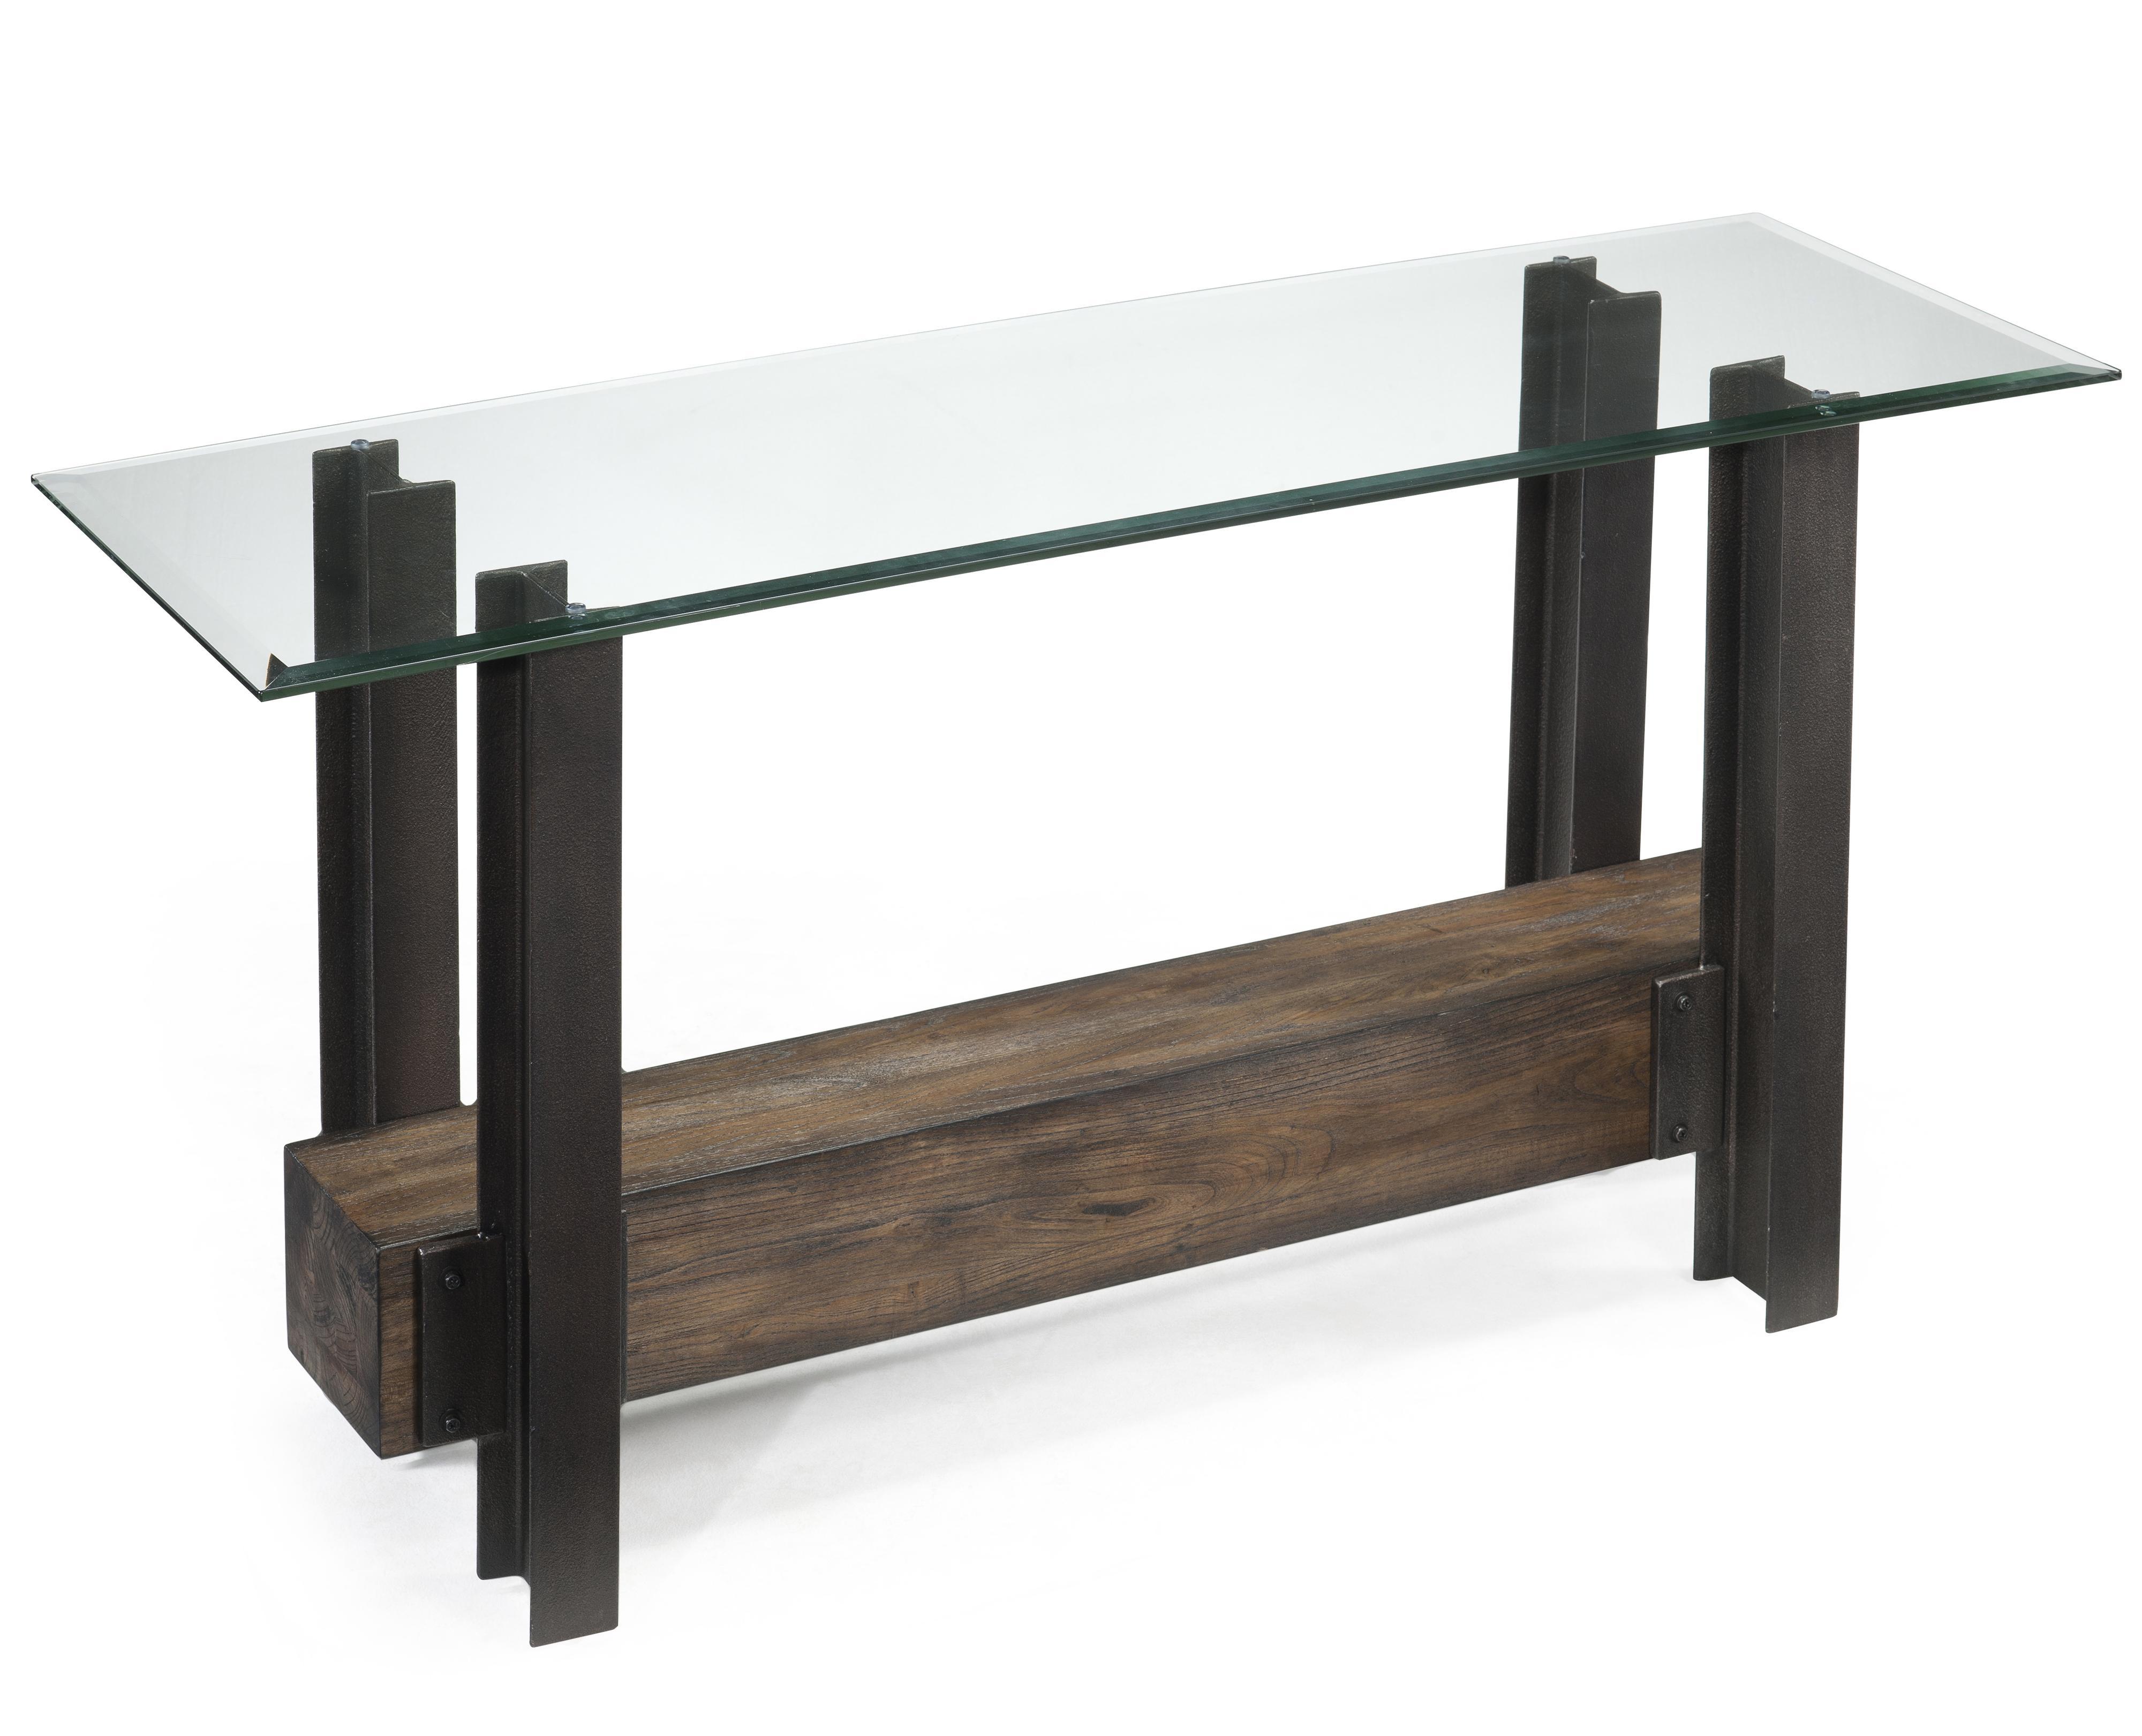 Magnussen Home Rowan Rustic Glass Top Rectangular Sofa Table